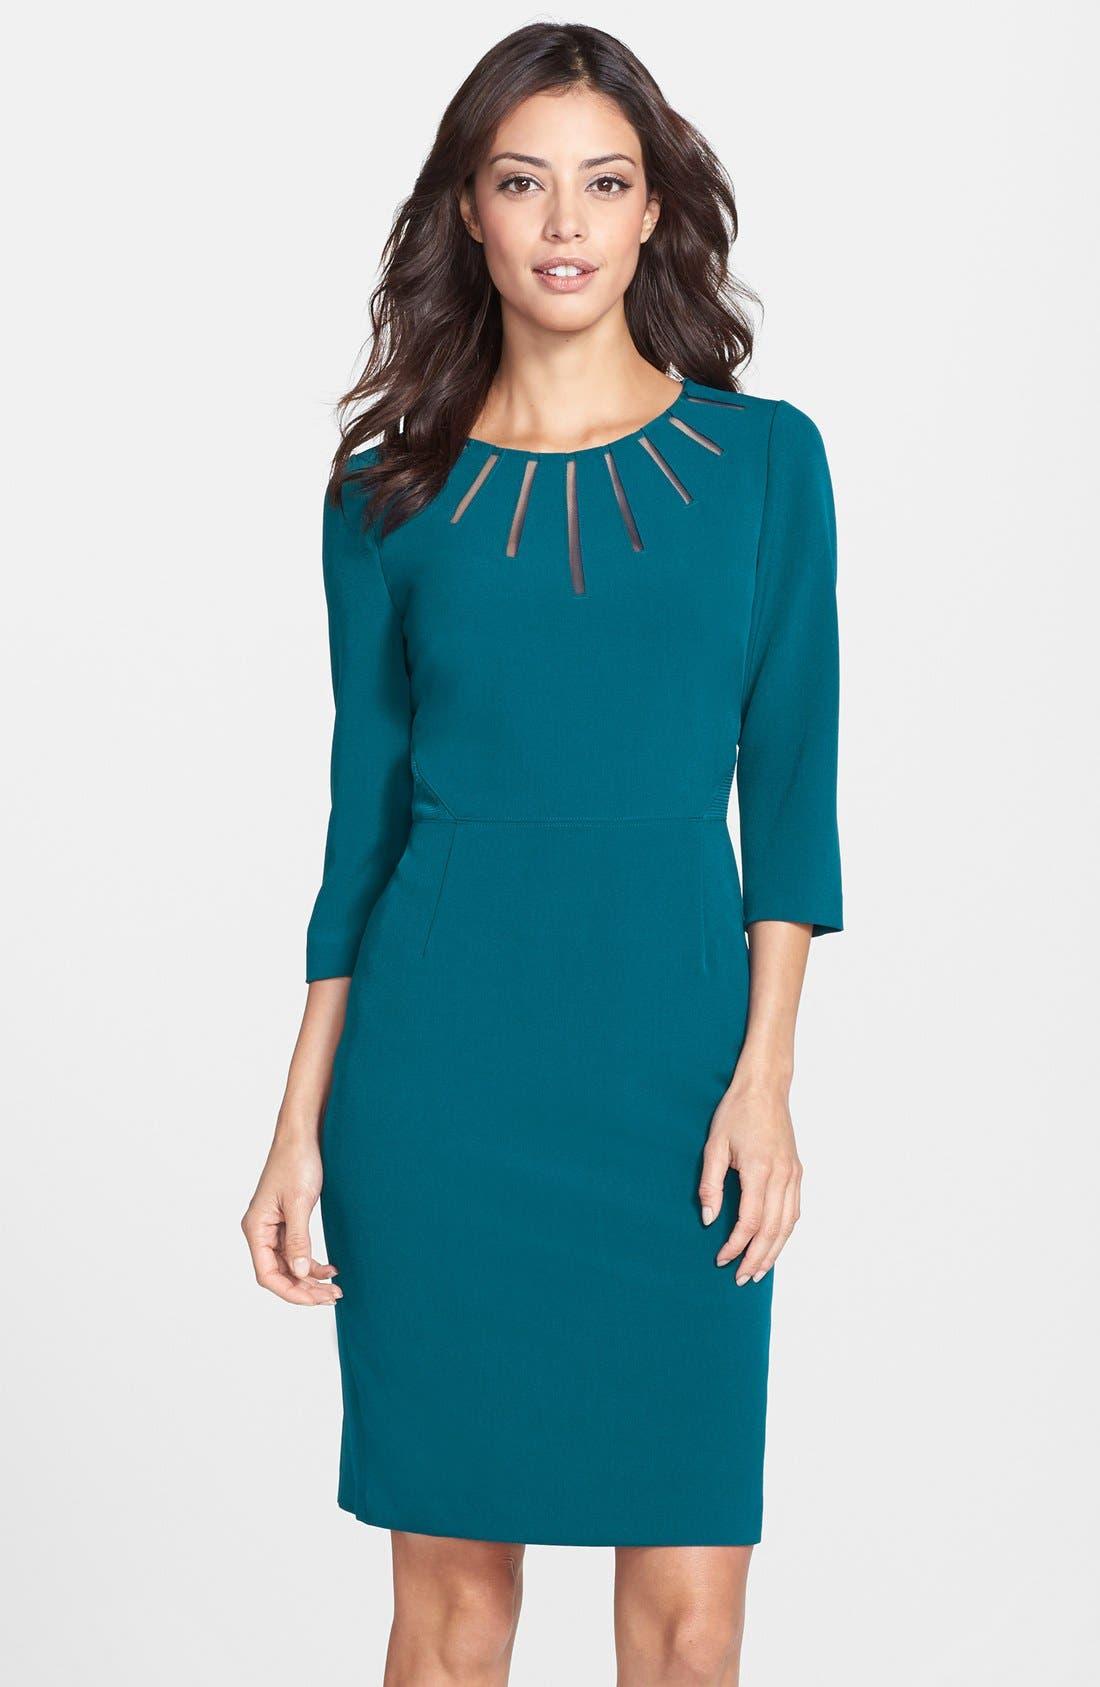 Alternate Image 1 Selected - Adrianna Papell Mesh Insert Crepe Sheath Dress (Regular & Petite)